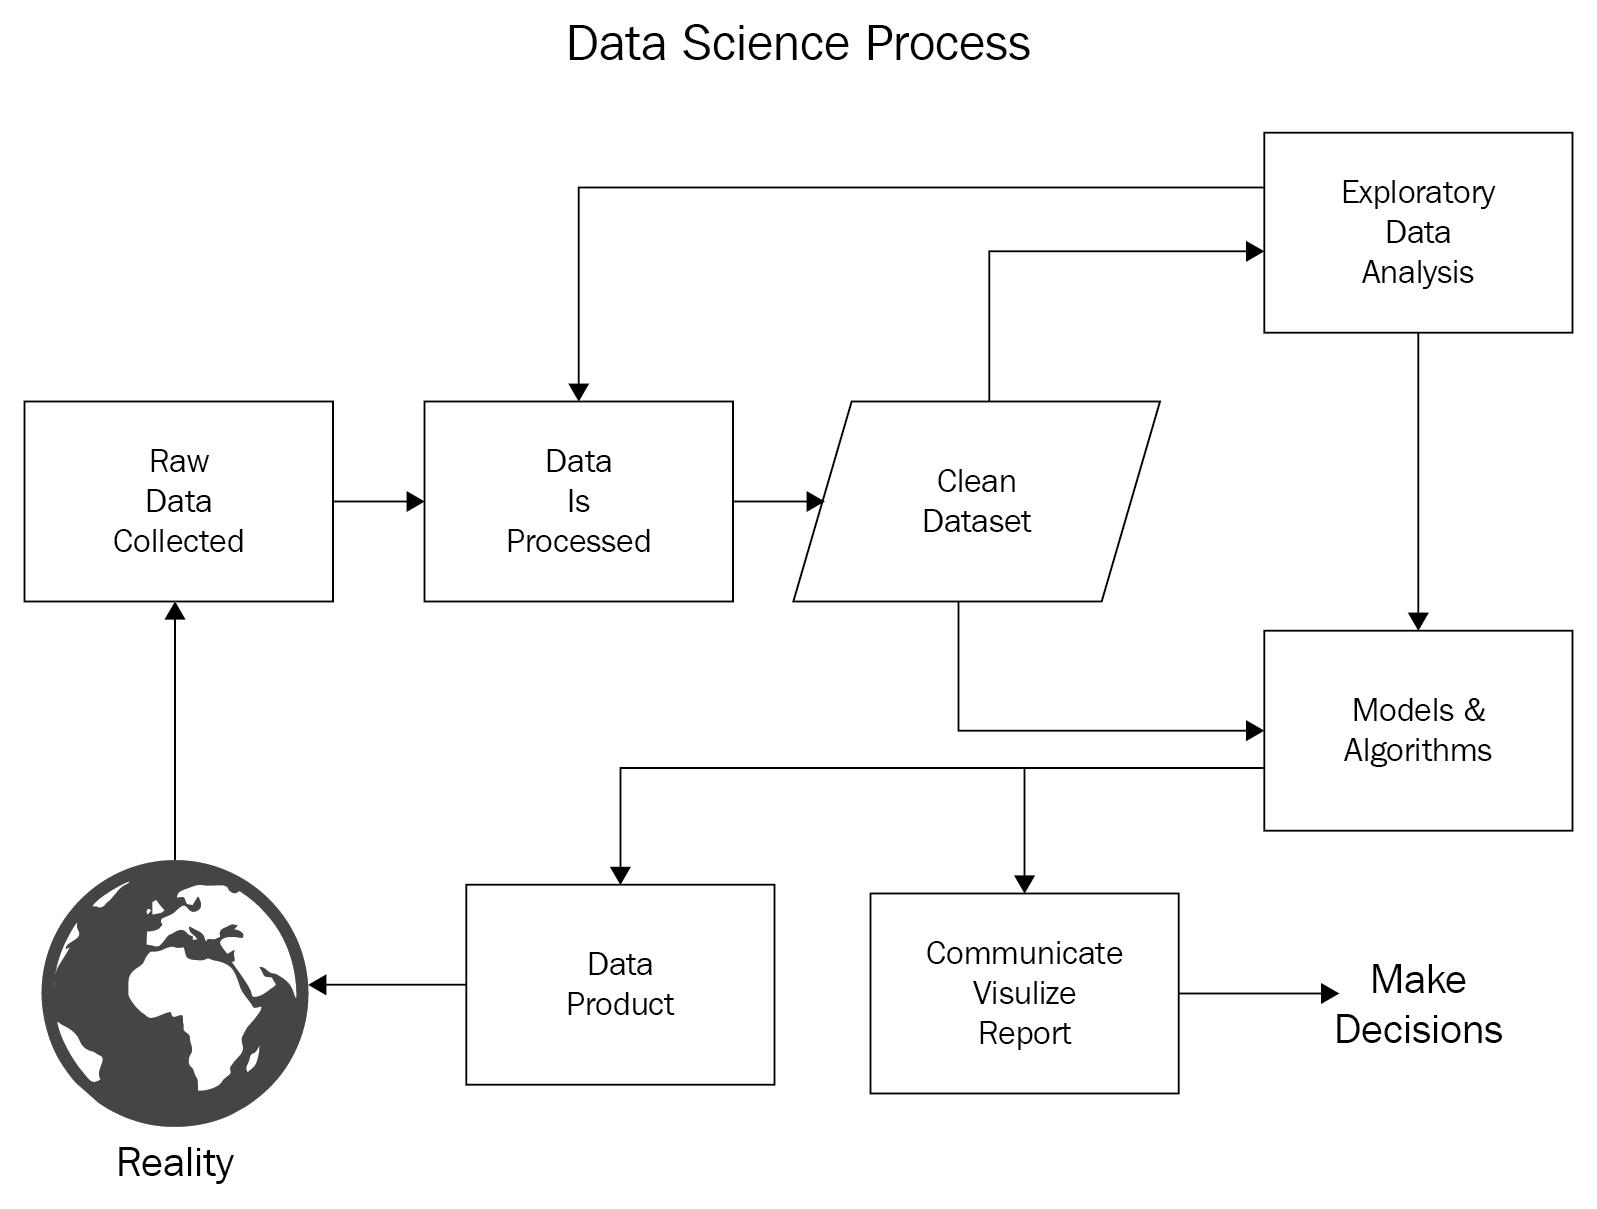 Exploratory Data Analysis of Boston Housing Data with NumPy